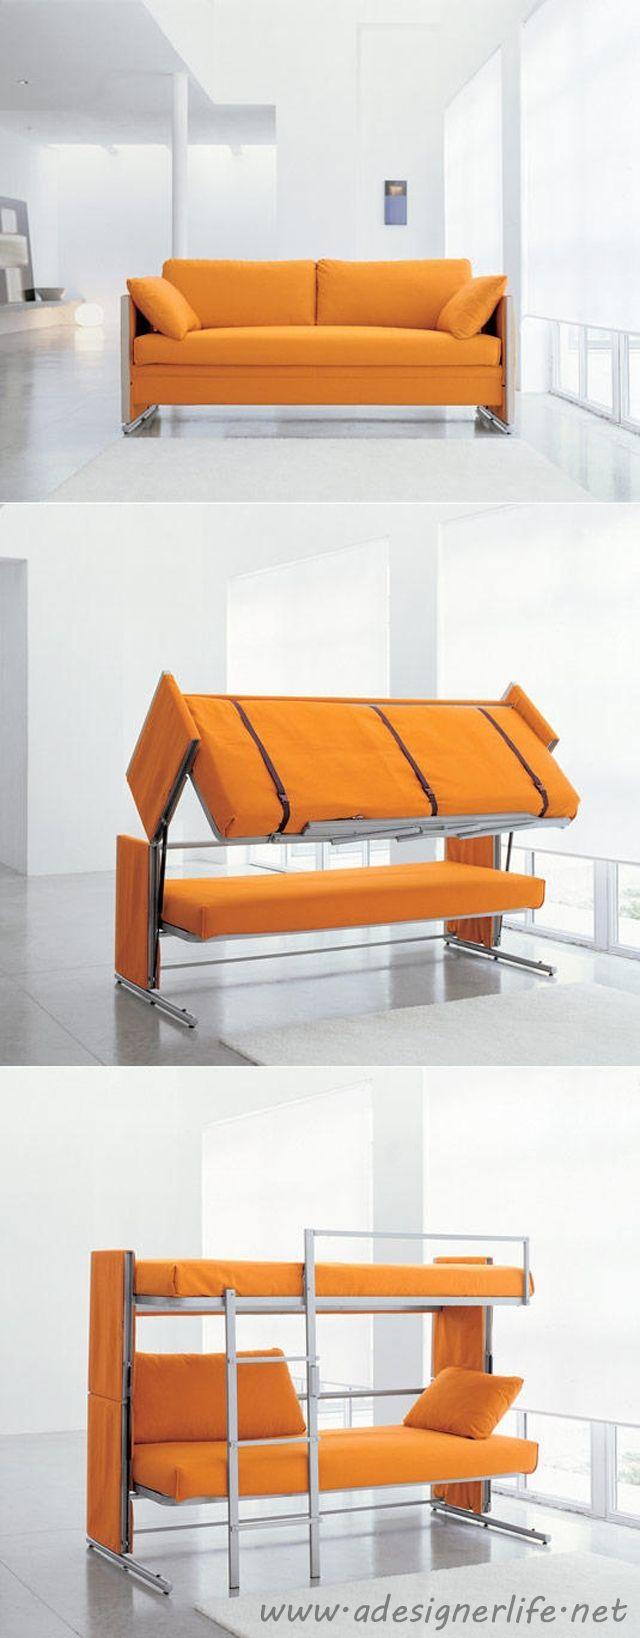 Resource Furniture Convertible Sofa To Bunk Bed Via A Designer Life